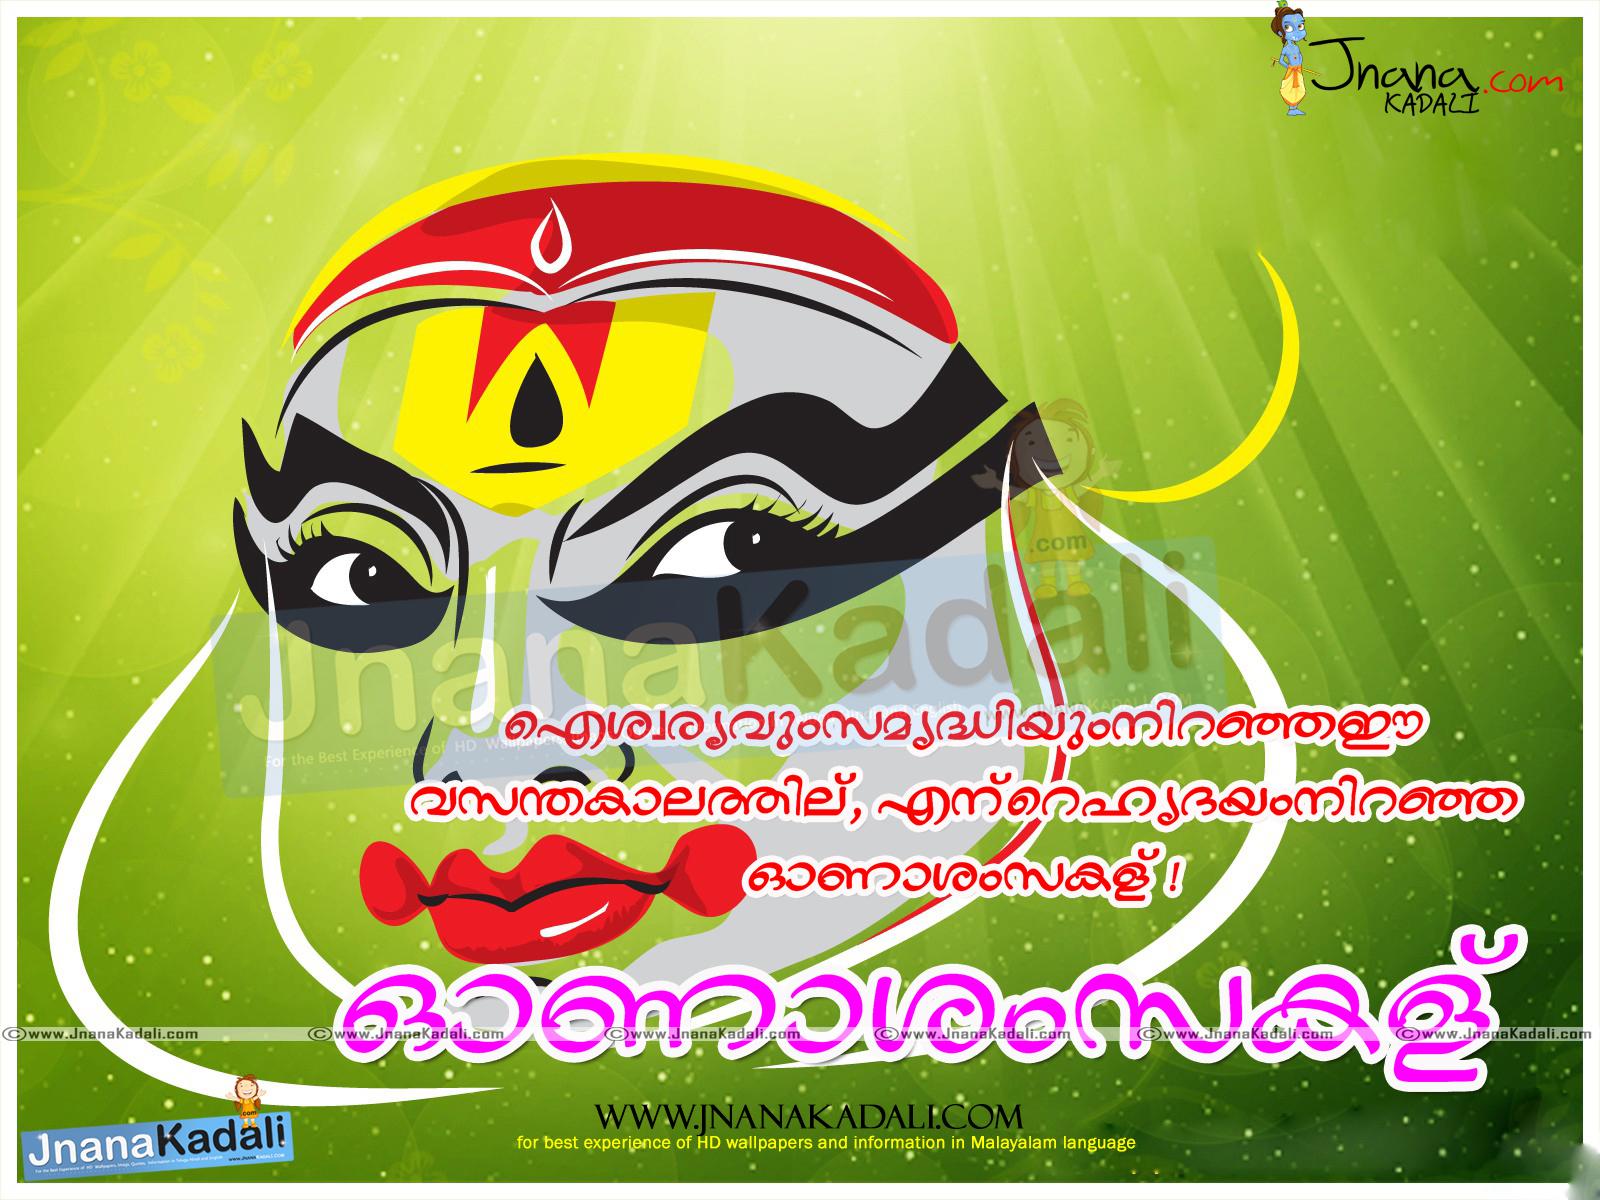 Onam wishes wallpapers labzada wallpaper onam wishes in malayalam onam ashamshagal onam hd wallpapers onam m4hsunfo